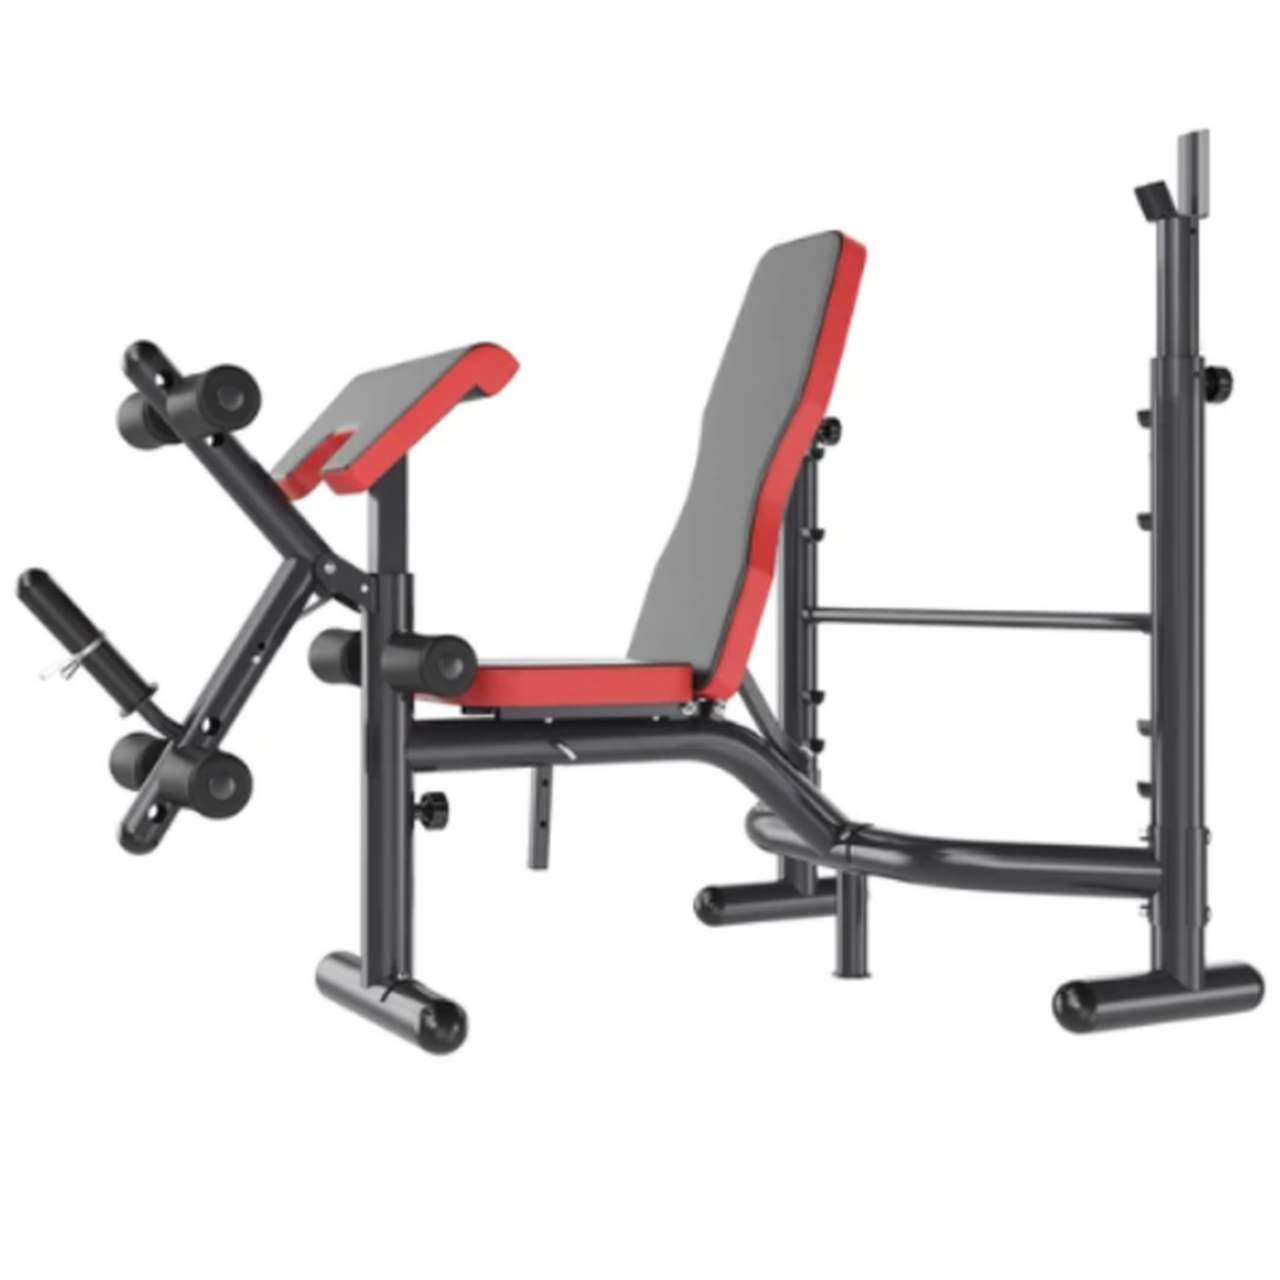 Heavy-duty Multi-function Workout Bench